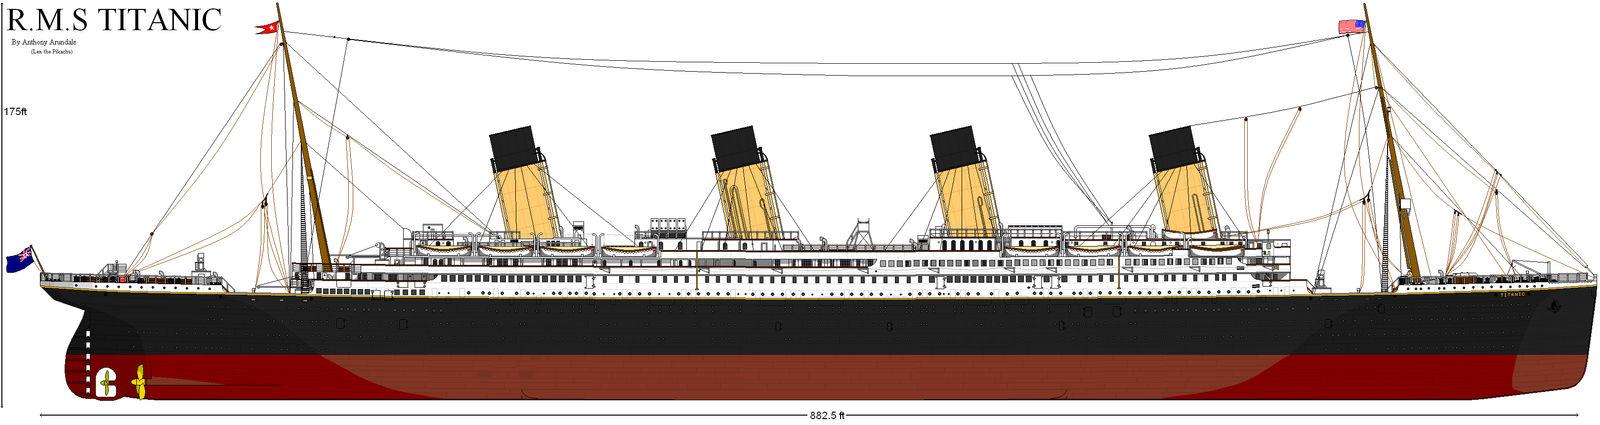 RMS TITANIC :2013 Update: